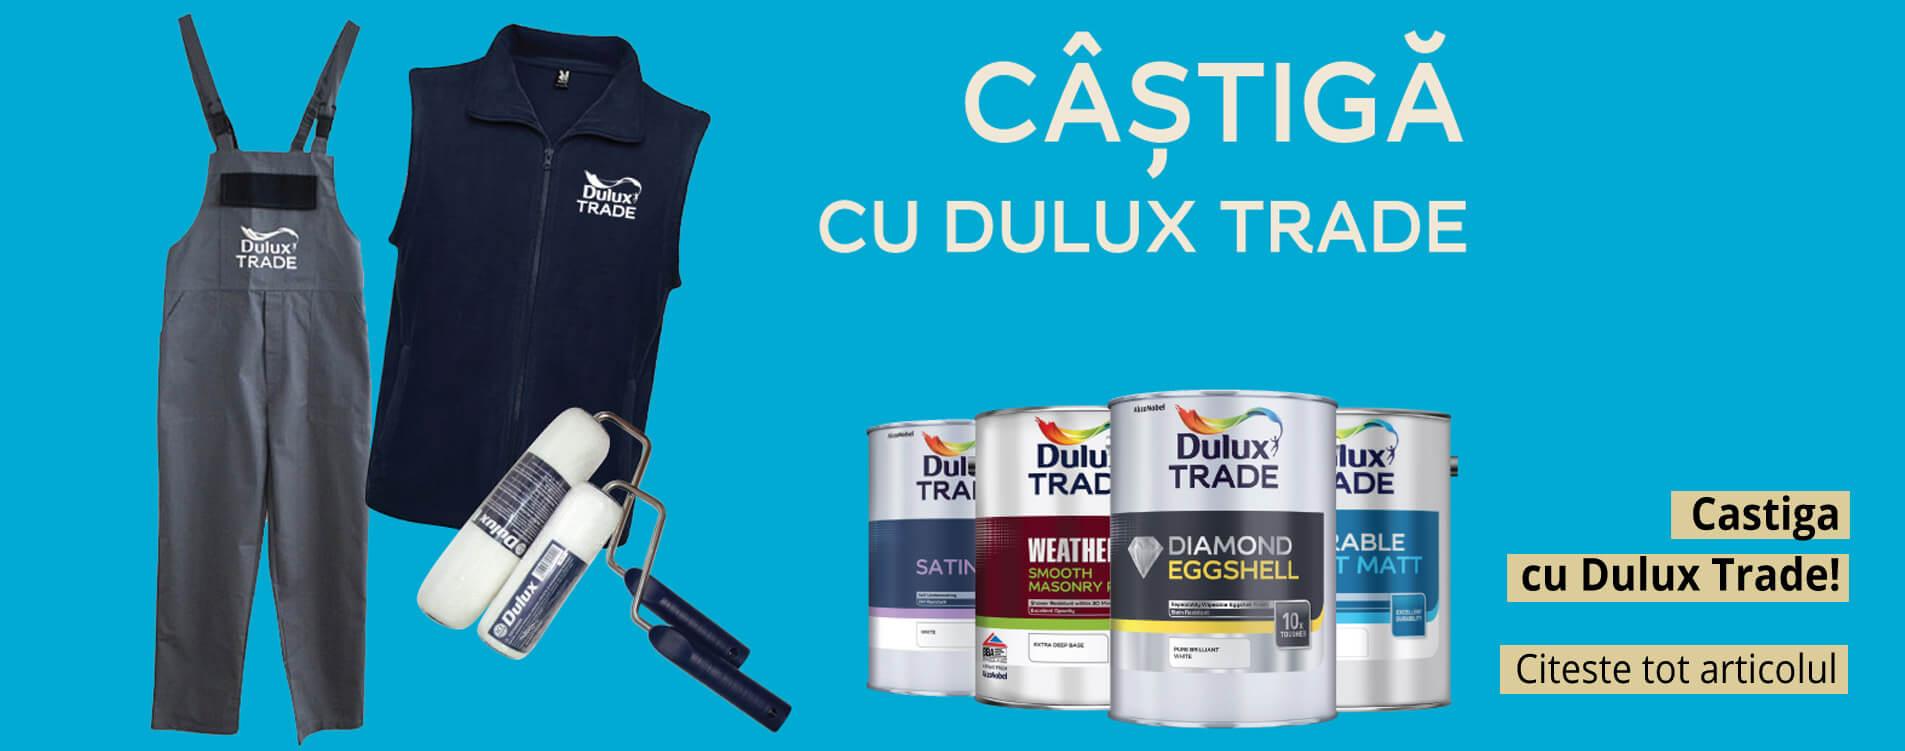 Castiga cu Dulux Trade